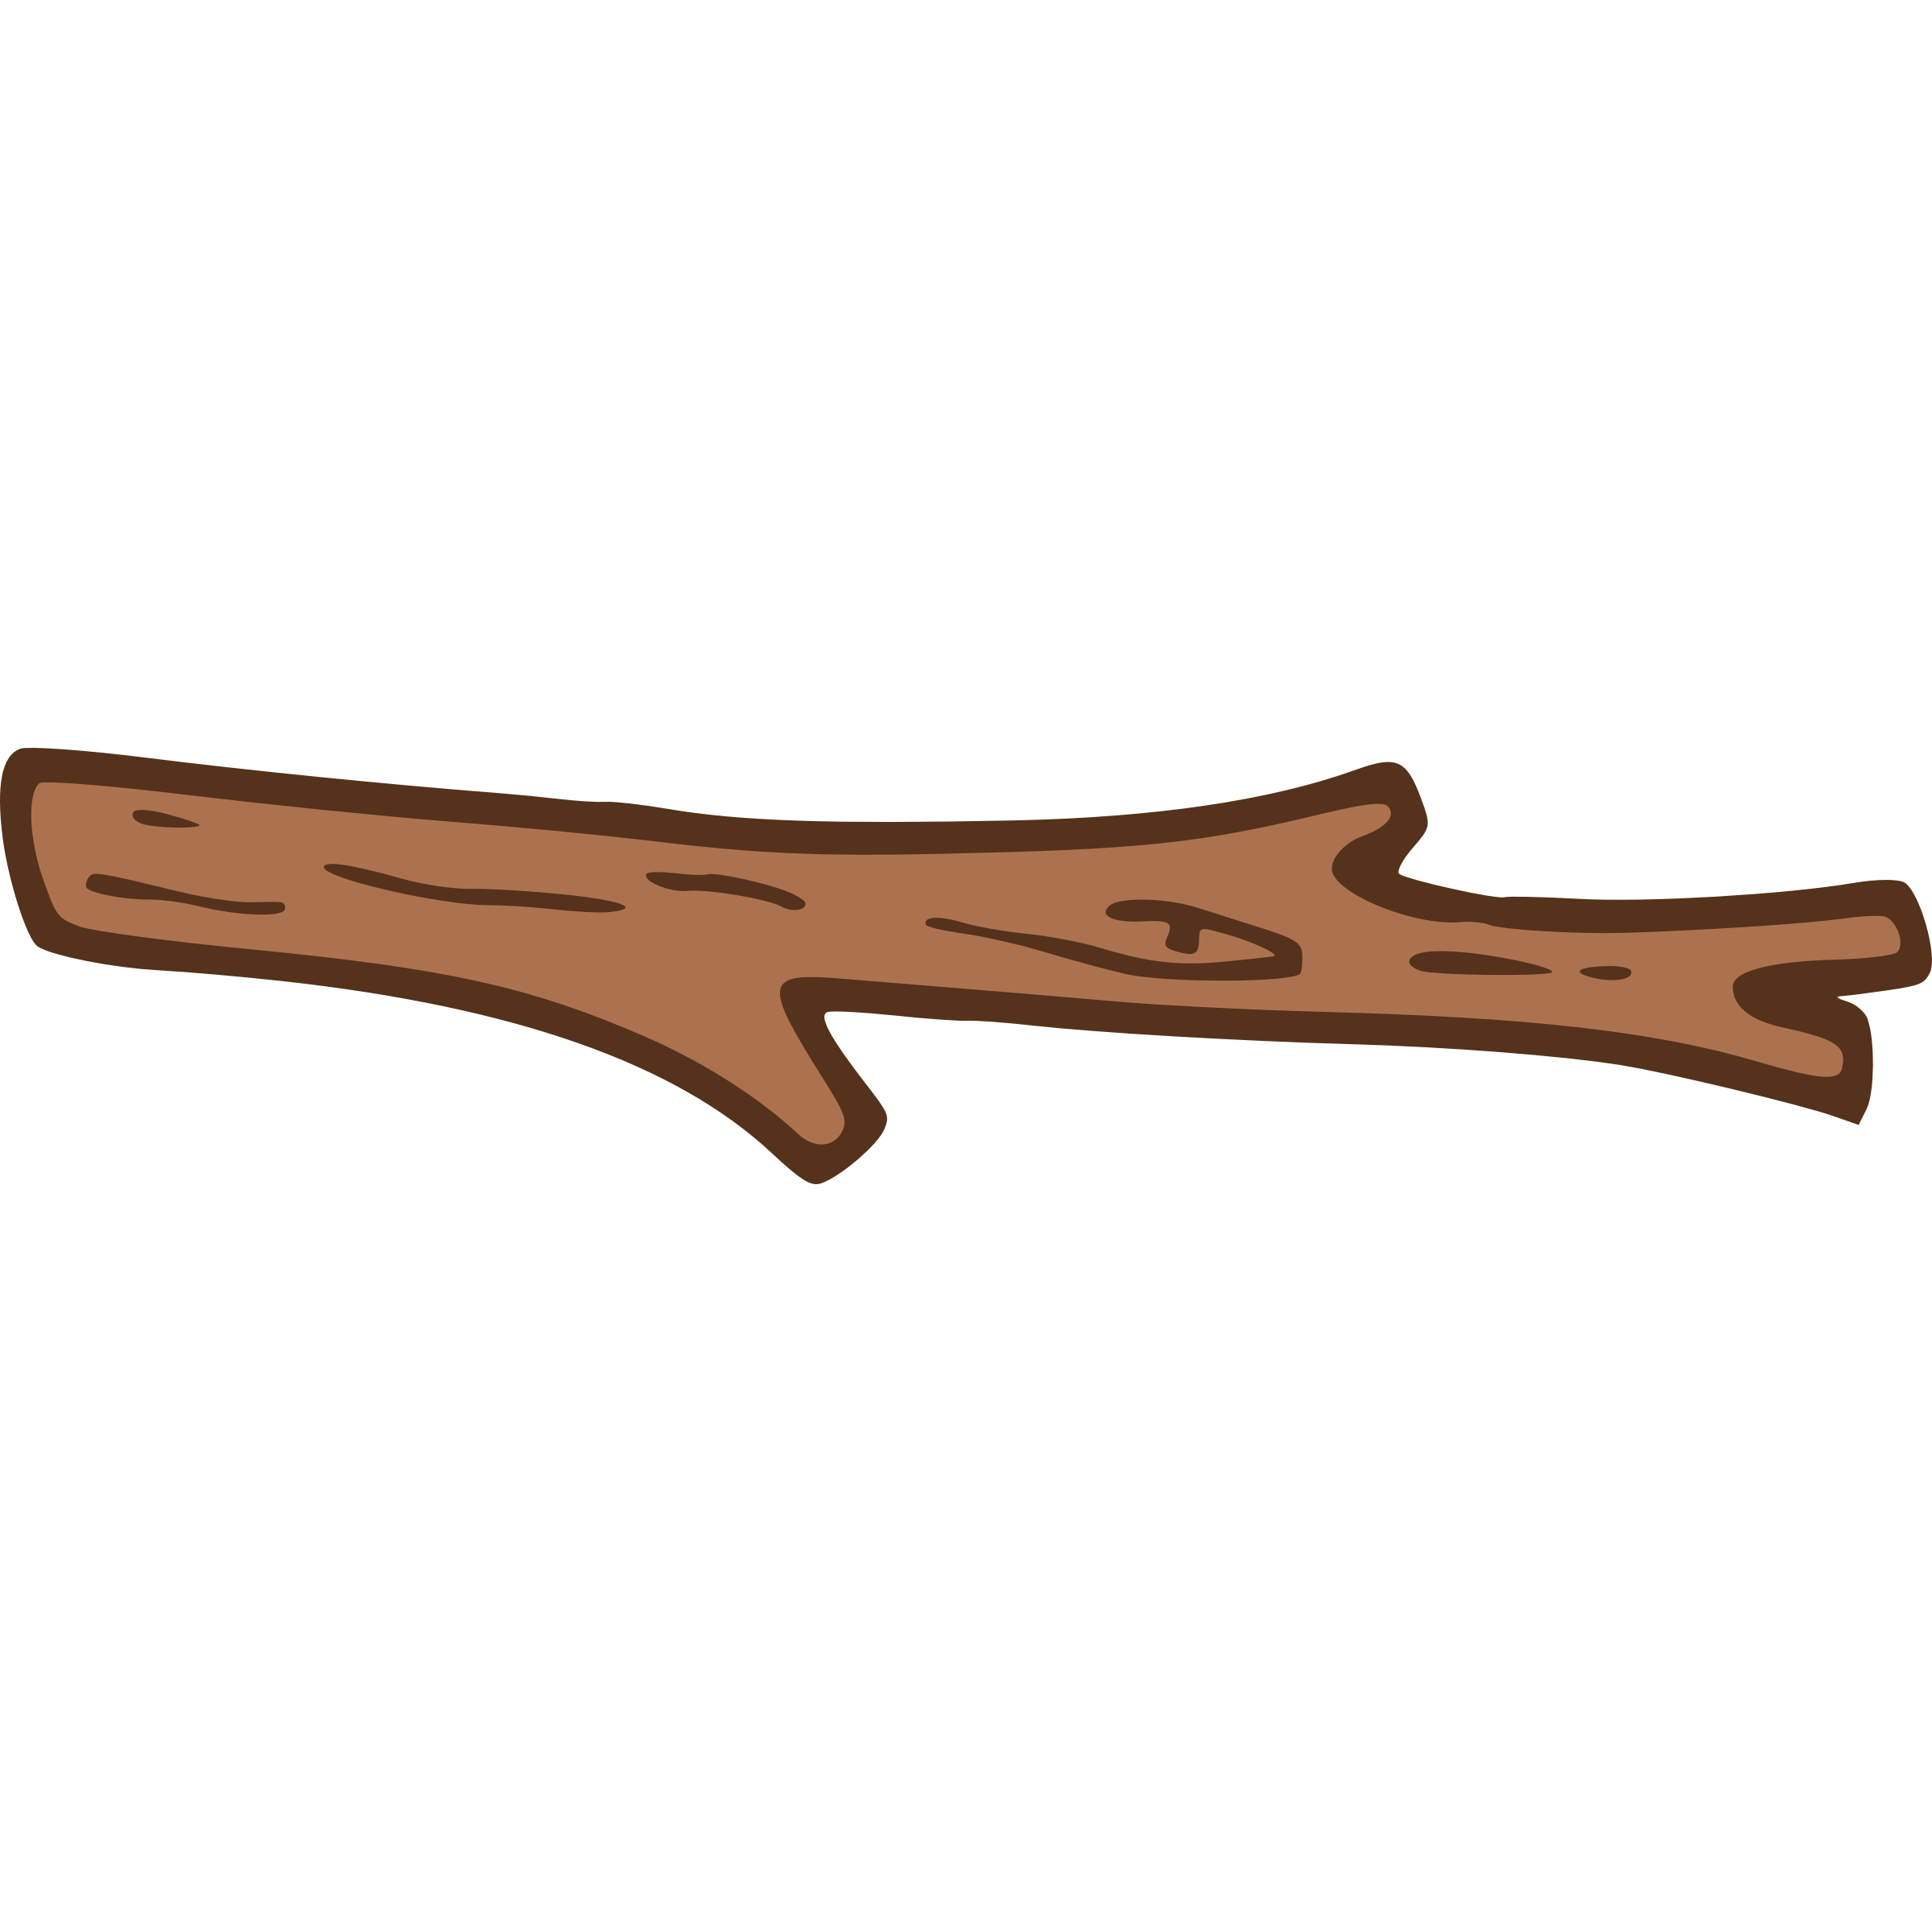 Hotdog clipart stick clipart. Free content hockey branch